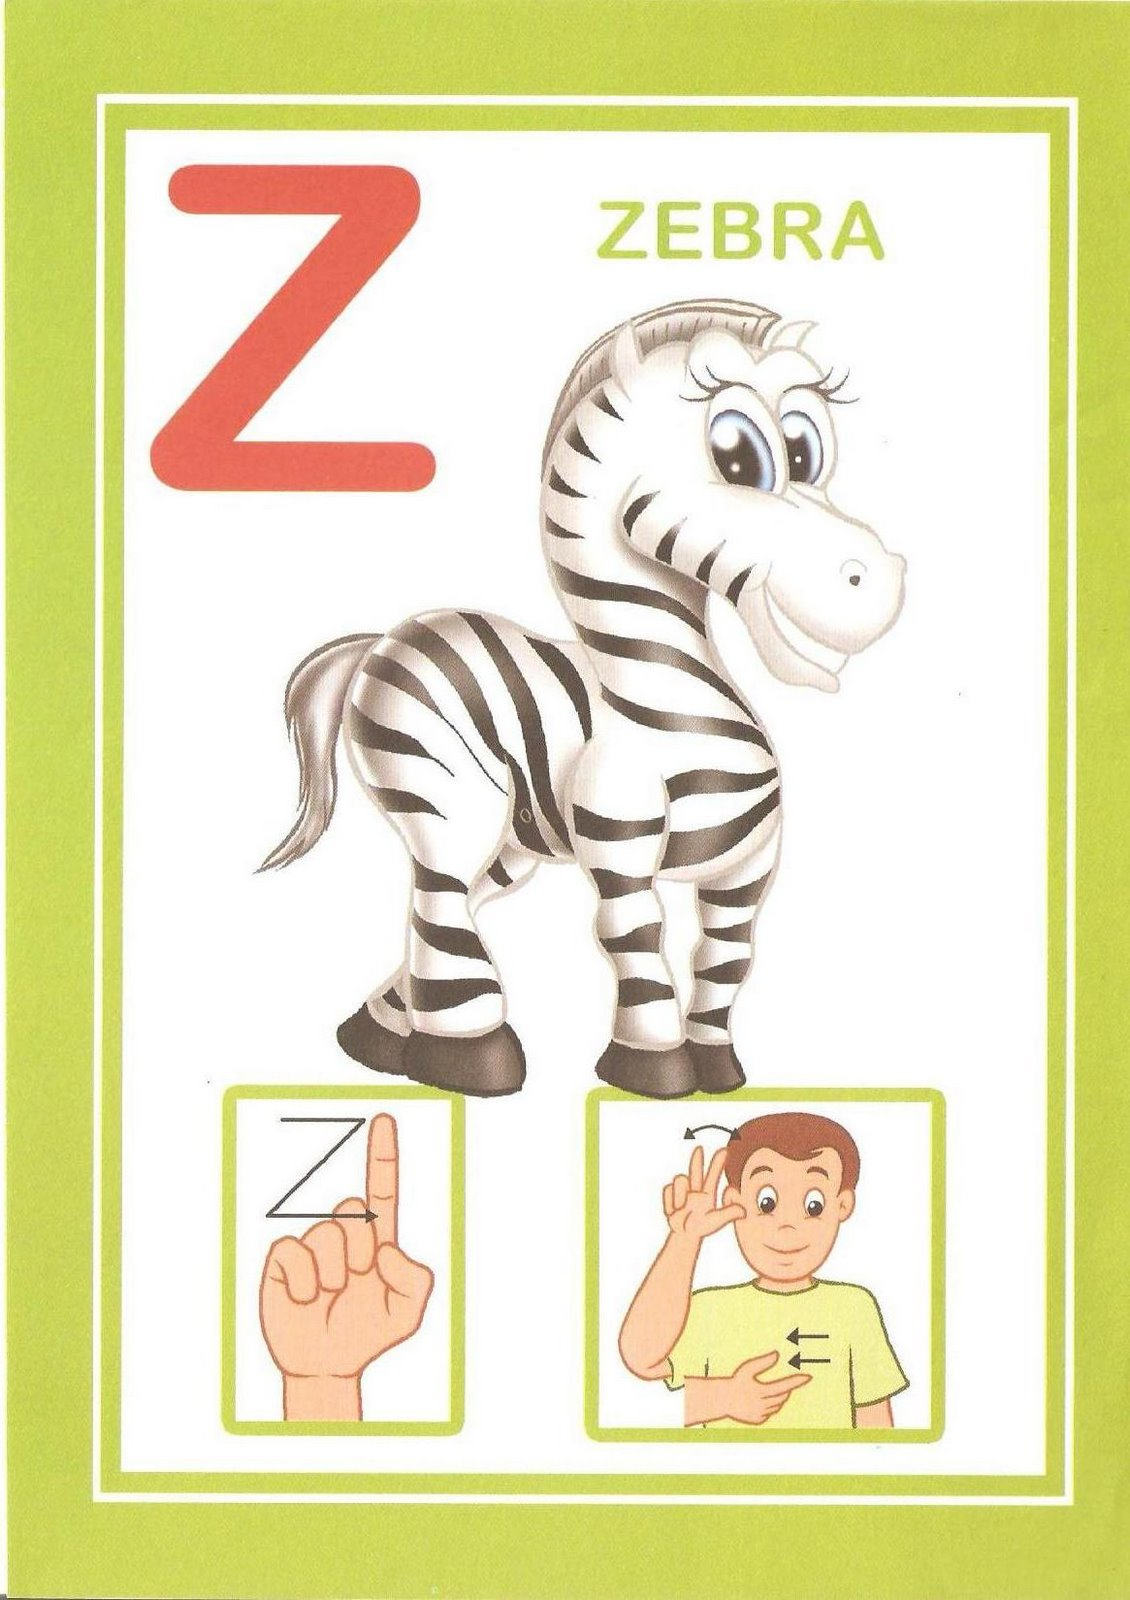 Aprendendo Libras: alfabeto ilustrado em libras #A63A25 1130 1600